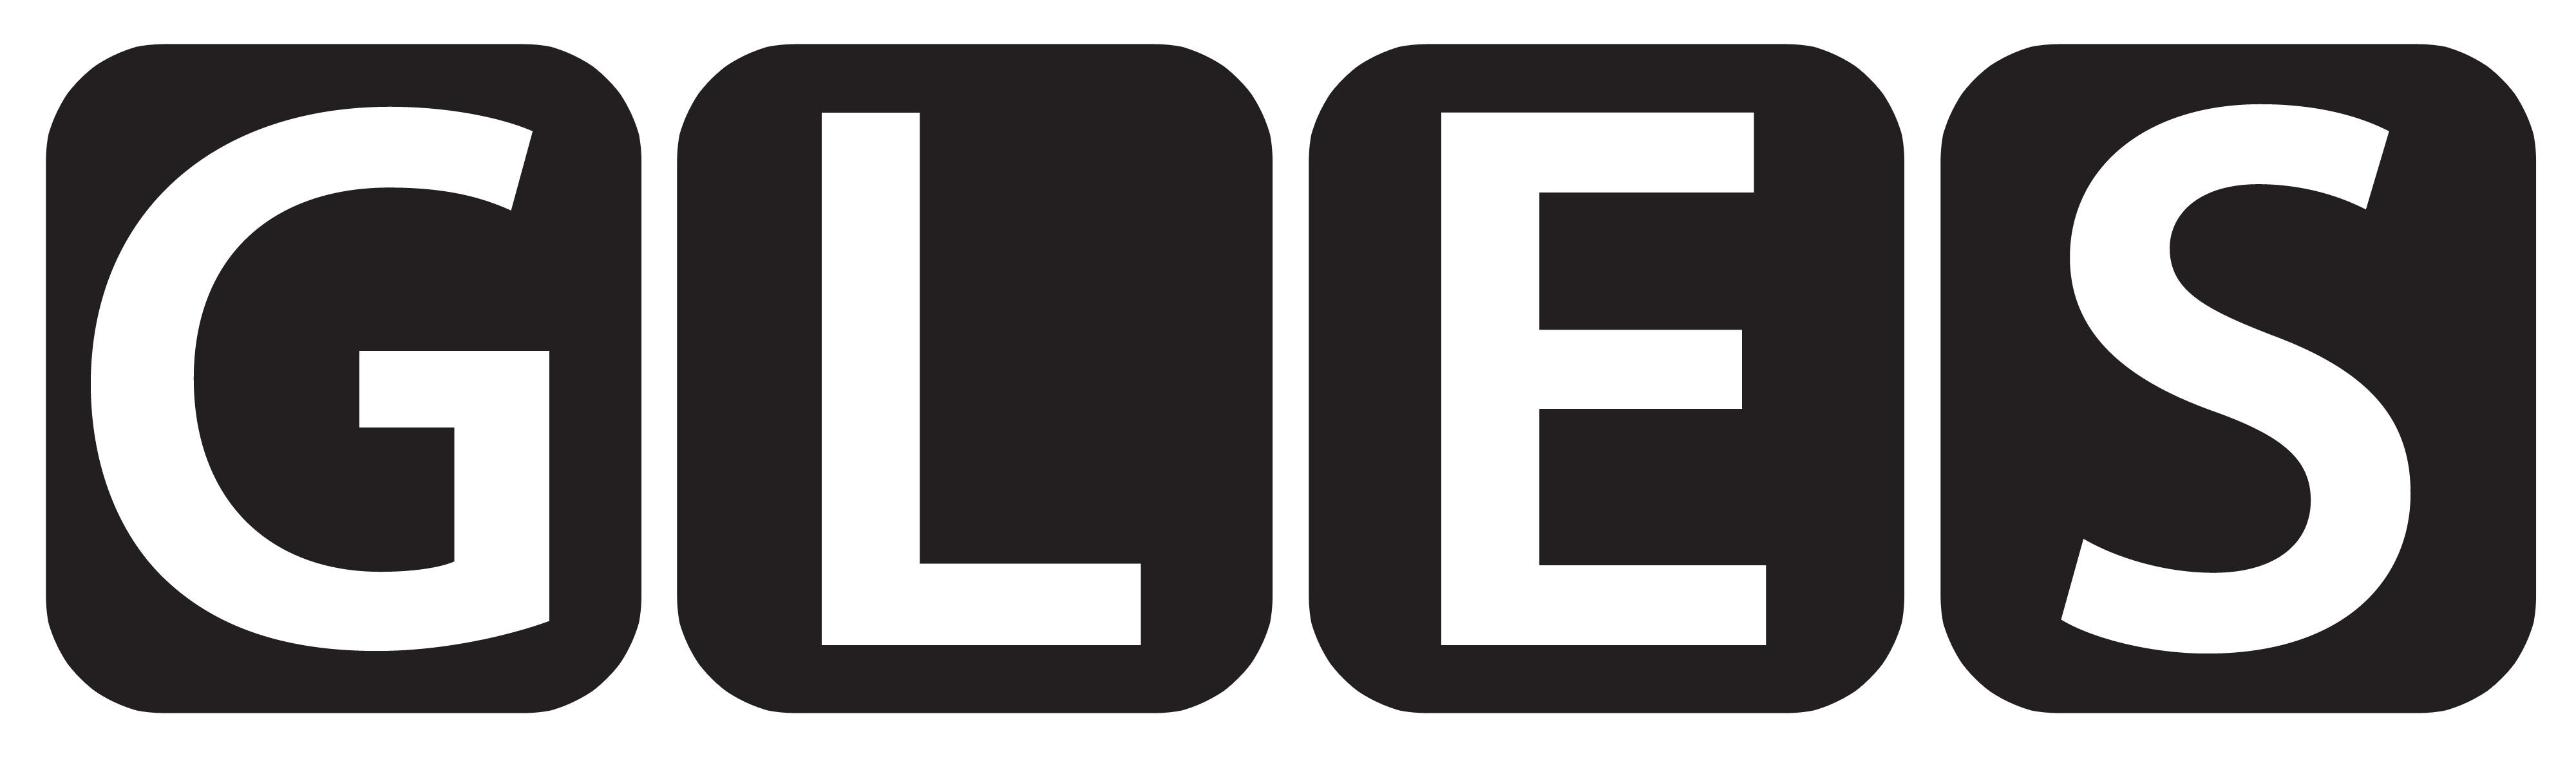 GLES logo png